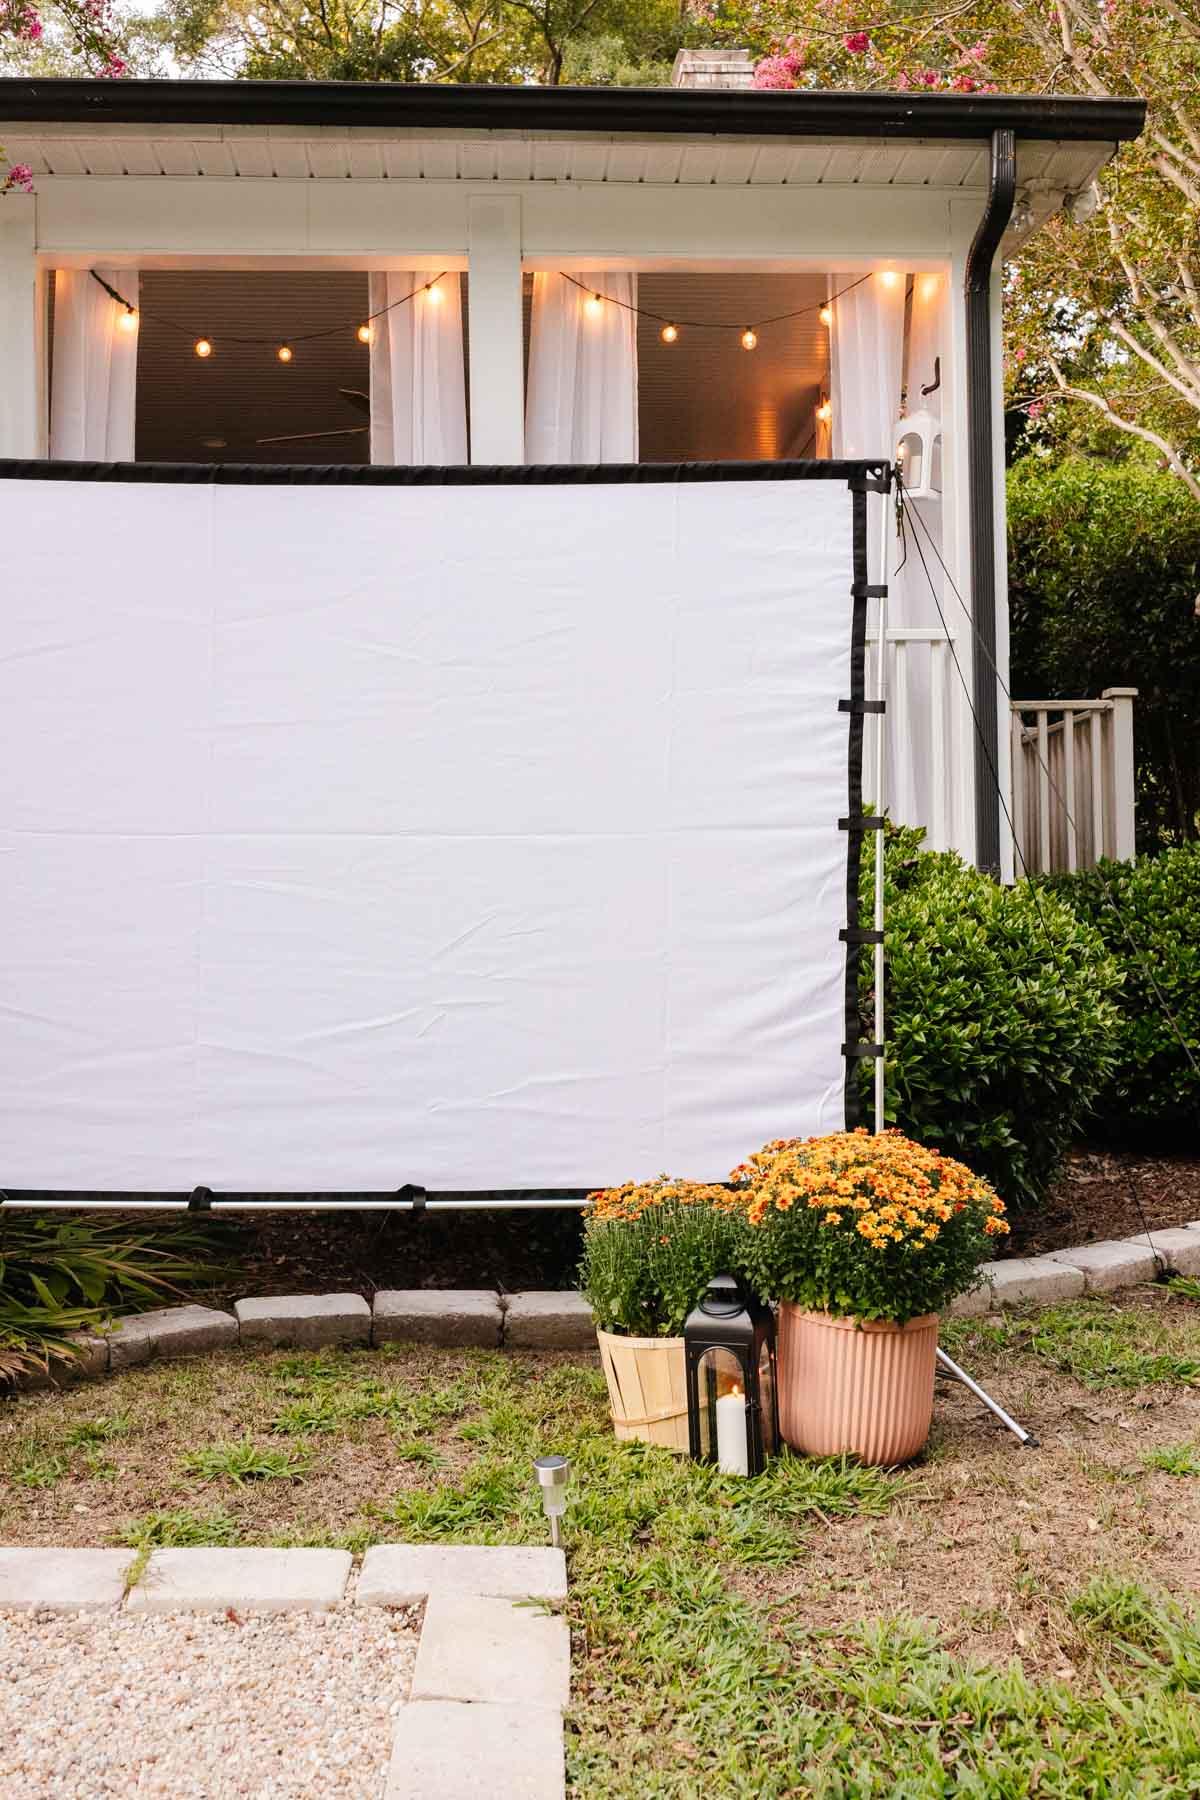 outdoor fall decor - garden mums and lanterns around outdoor movie screen for backyard party